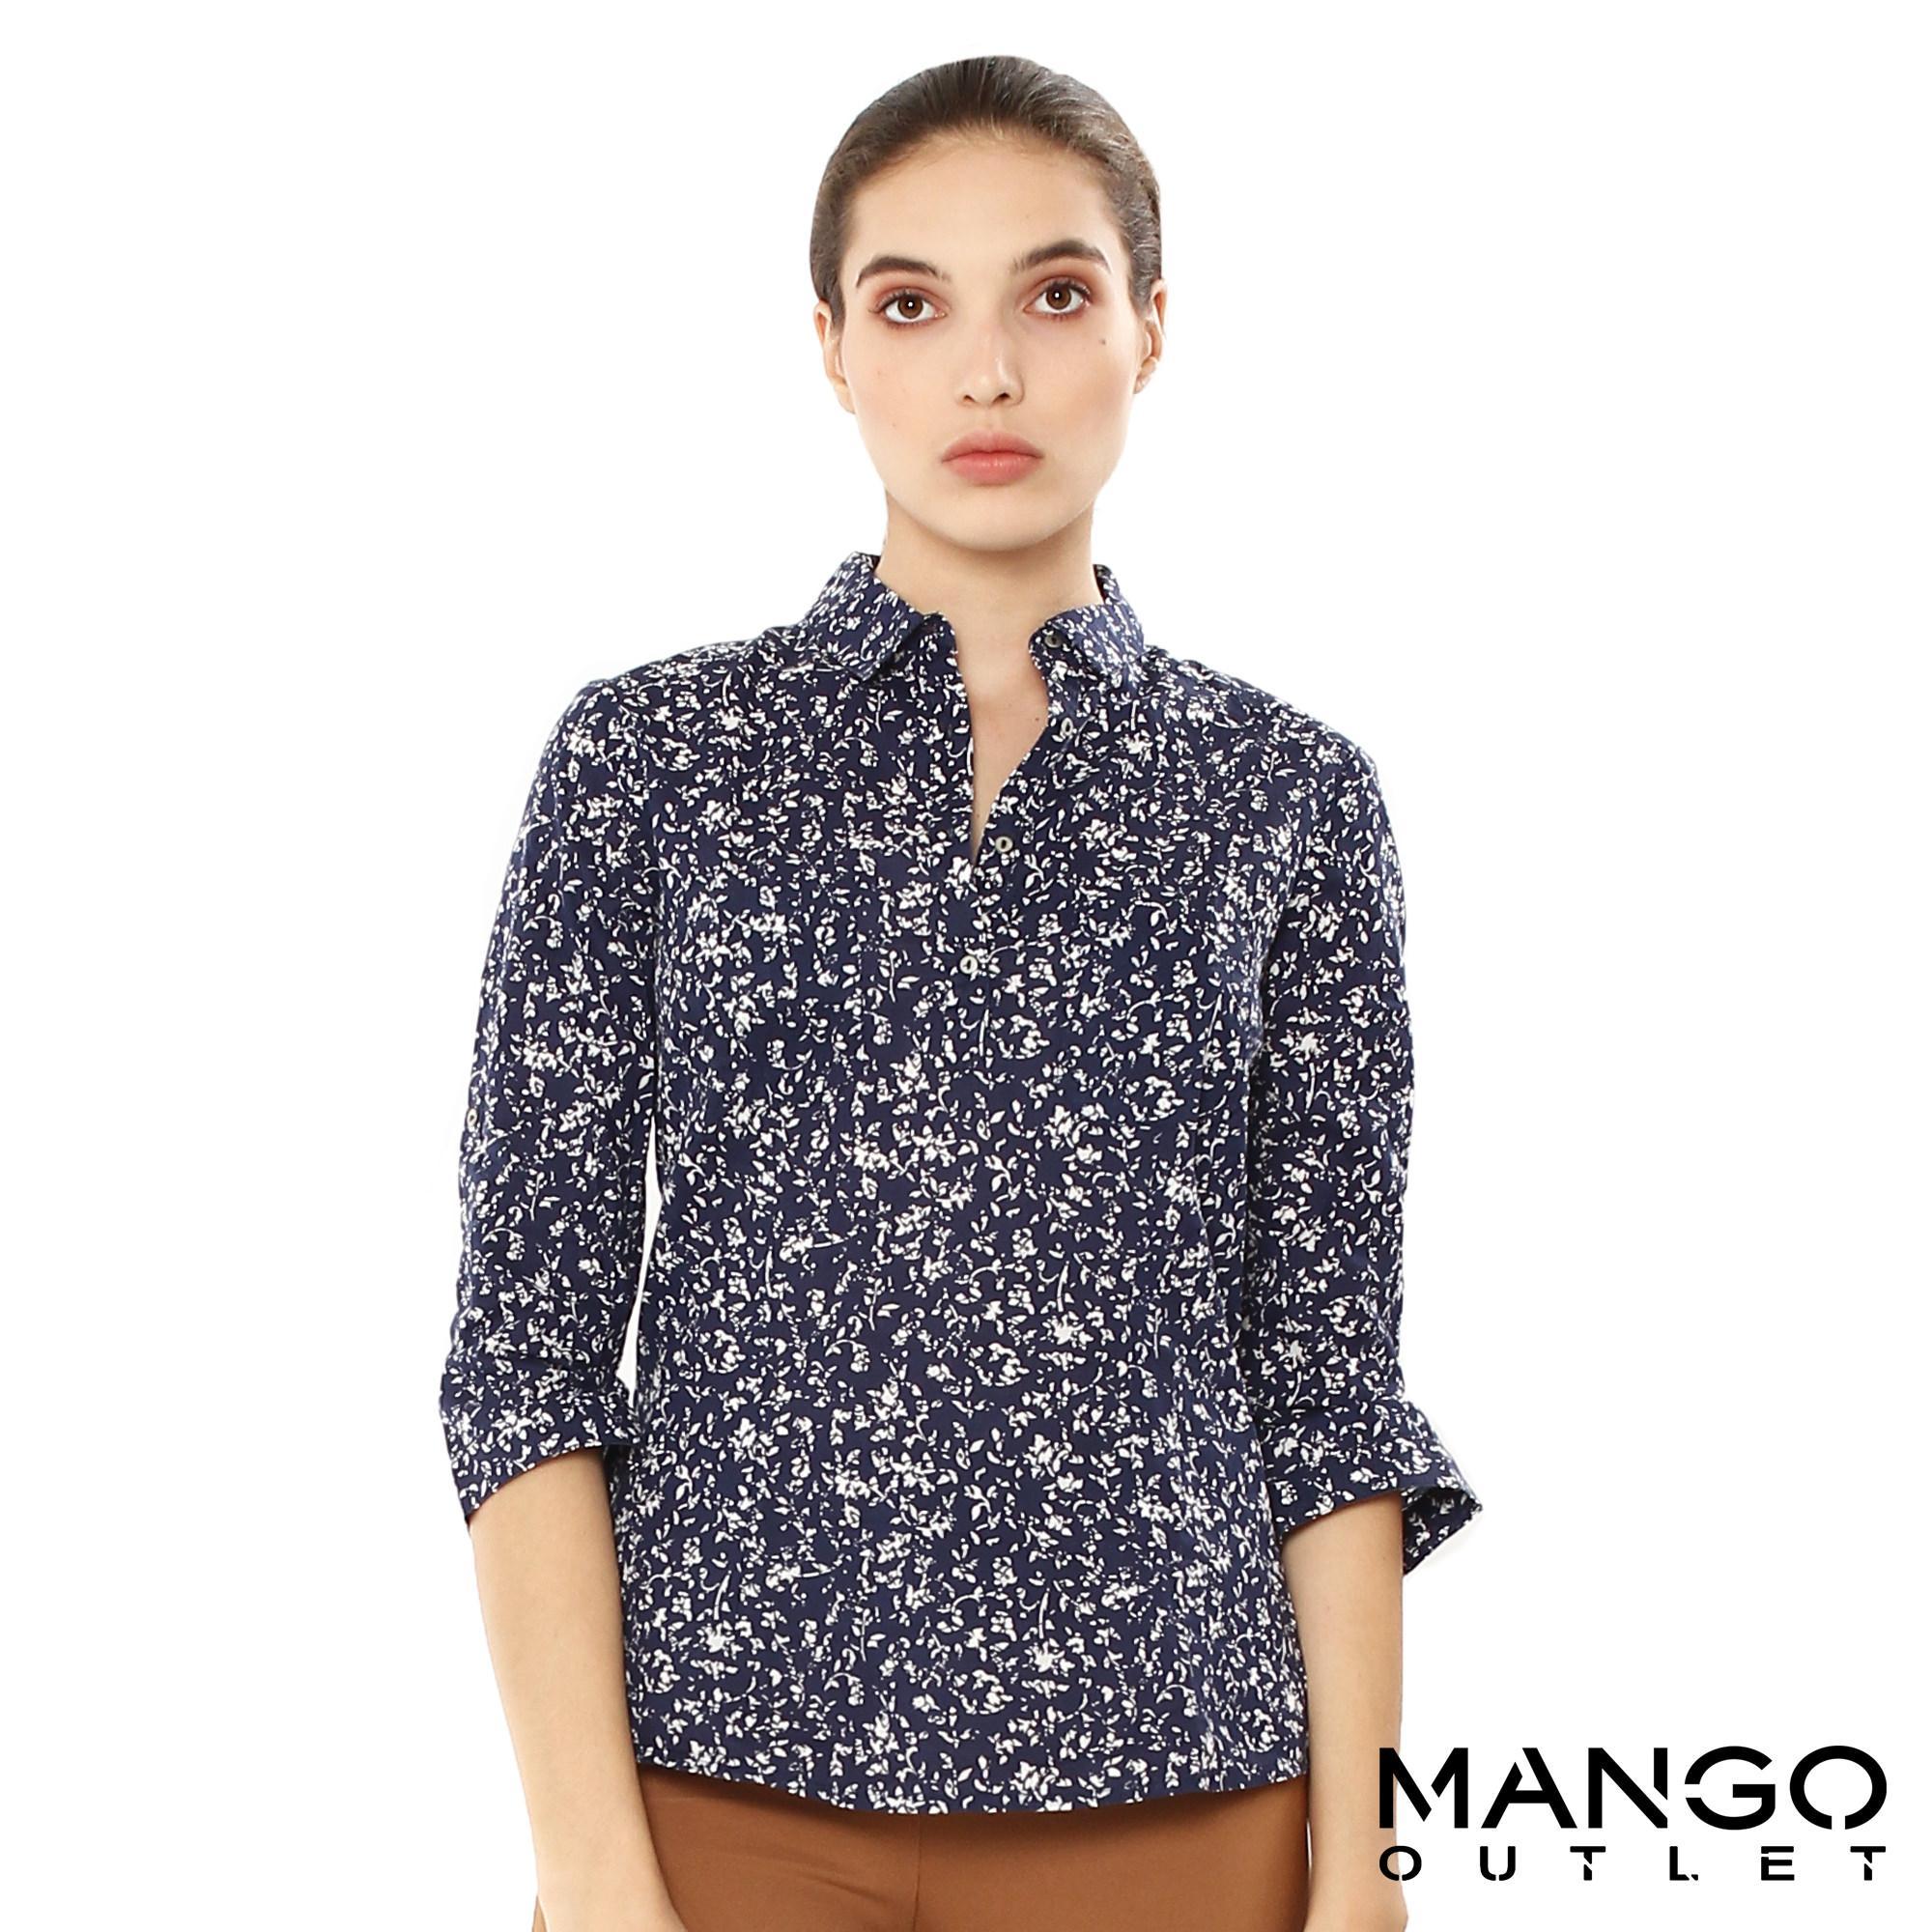 a38c9009b2 Mango Philippines  Mango price list - Mango Satchel